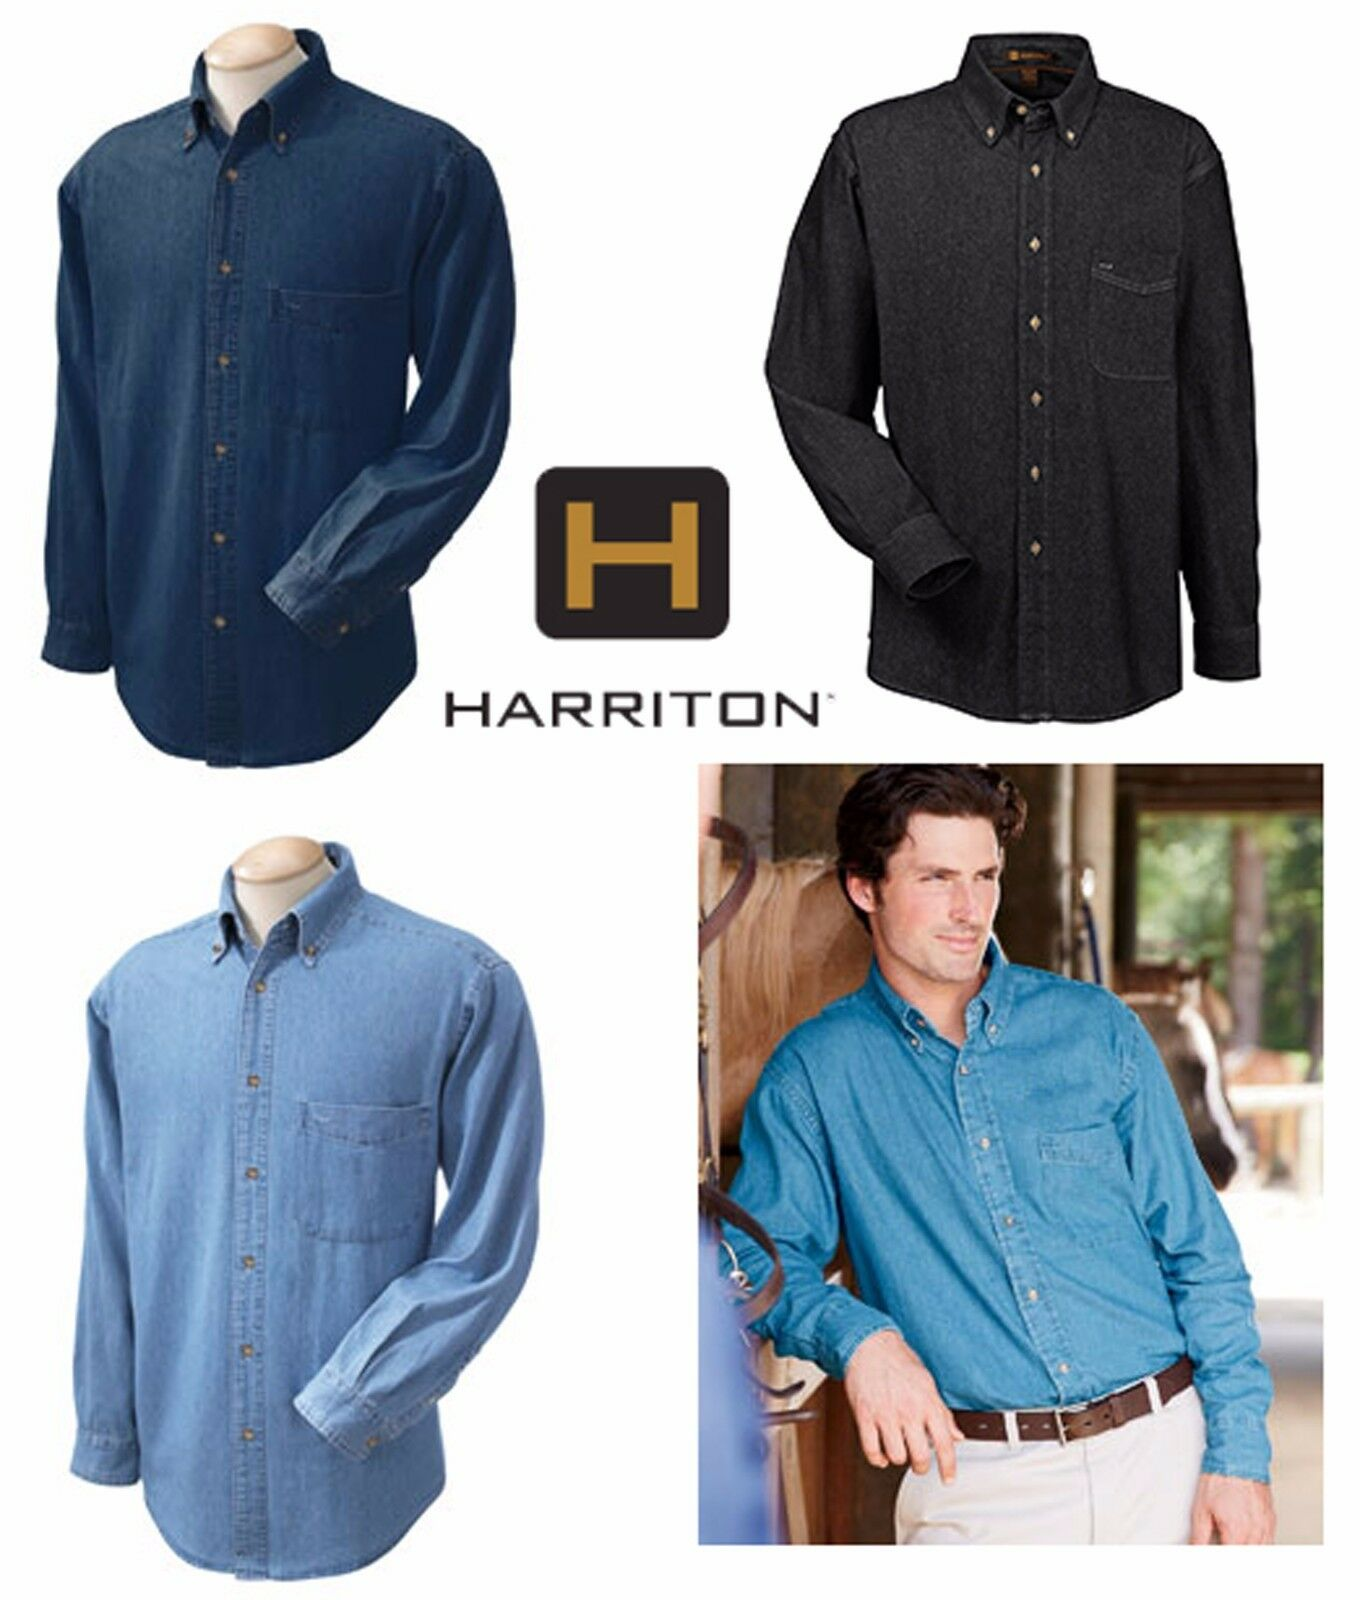 205d96013dd Harriton Men s 6.5 oz. Long-Sleeve Denim Button-up Shirt S-6XL M550 ...